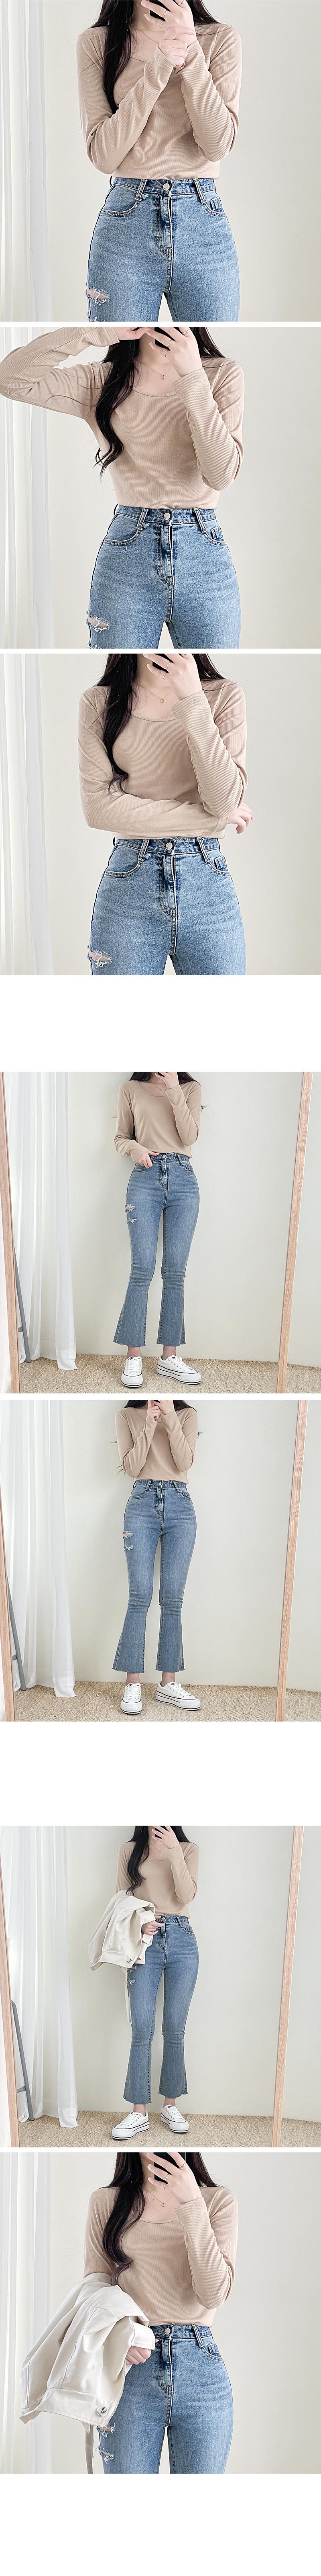 Teuim cut denim Flared pants